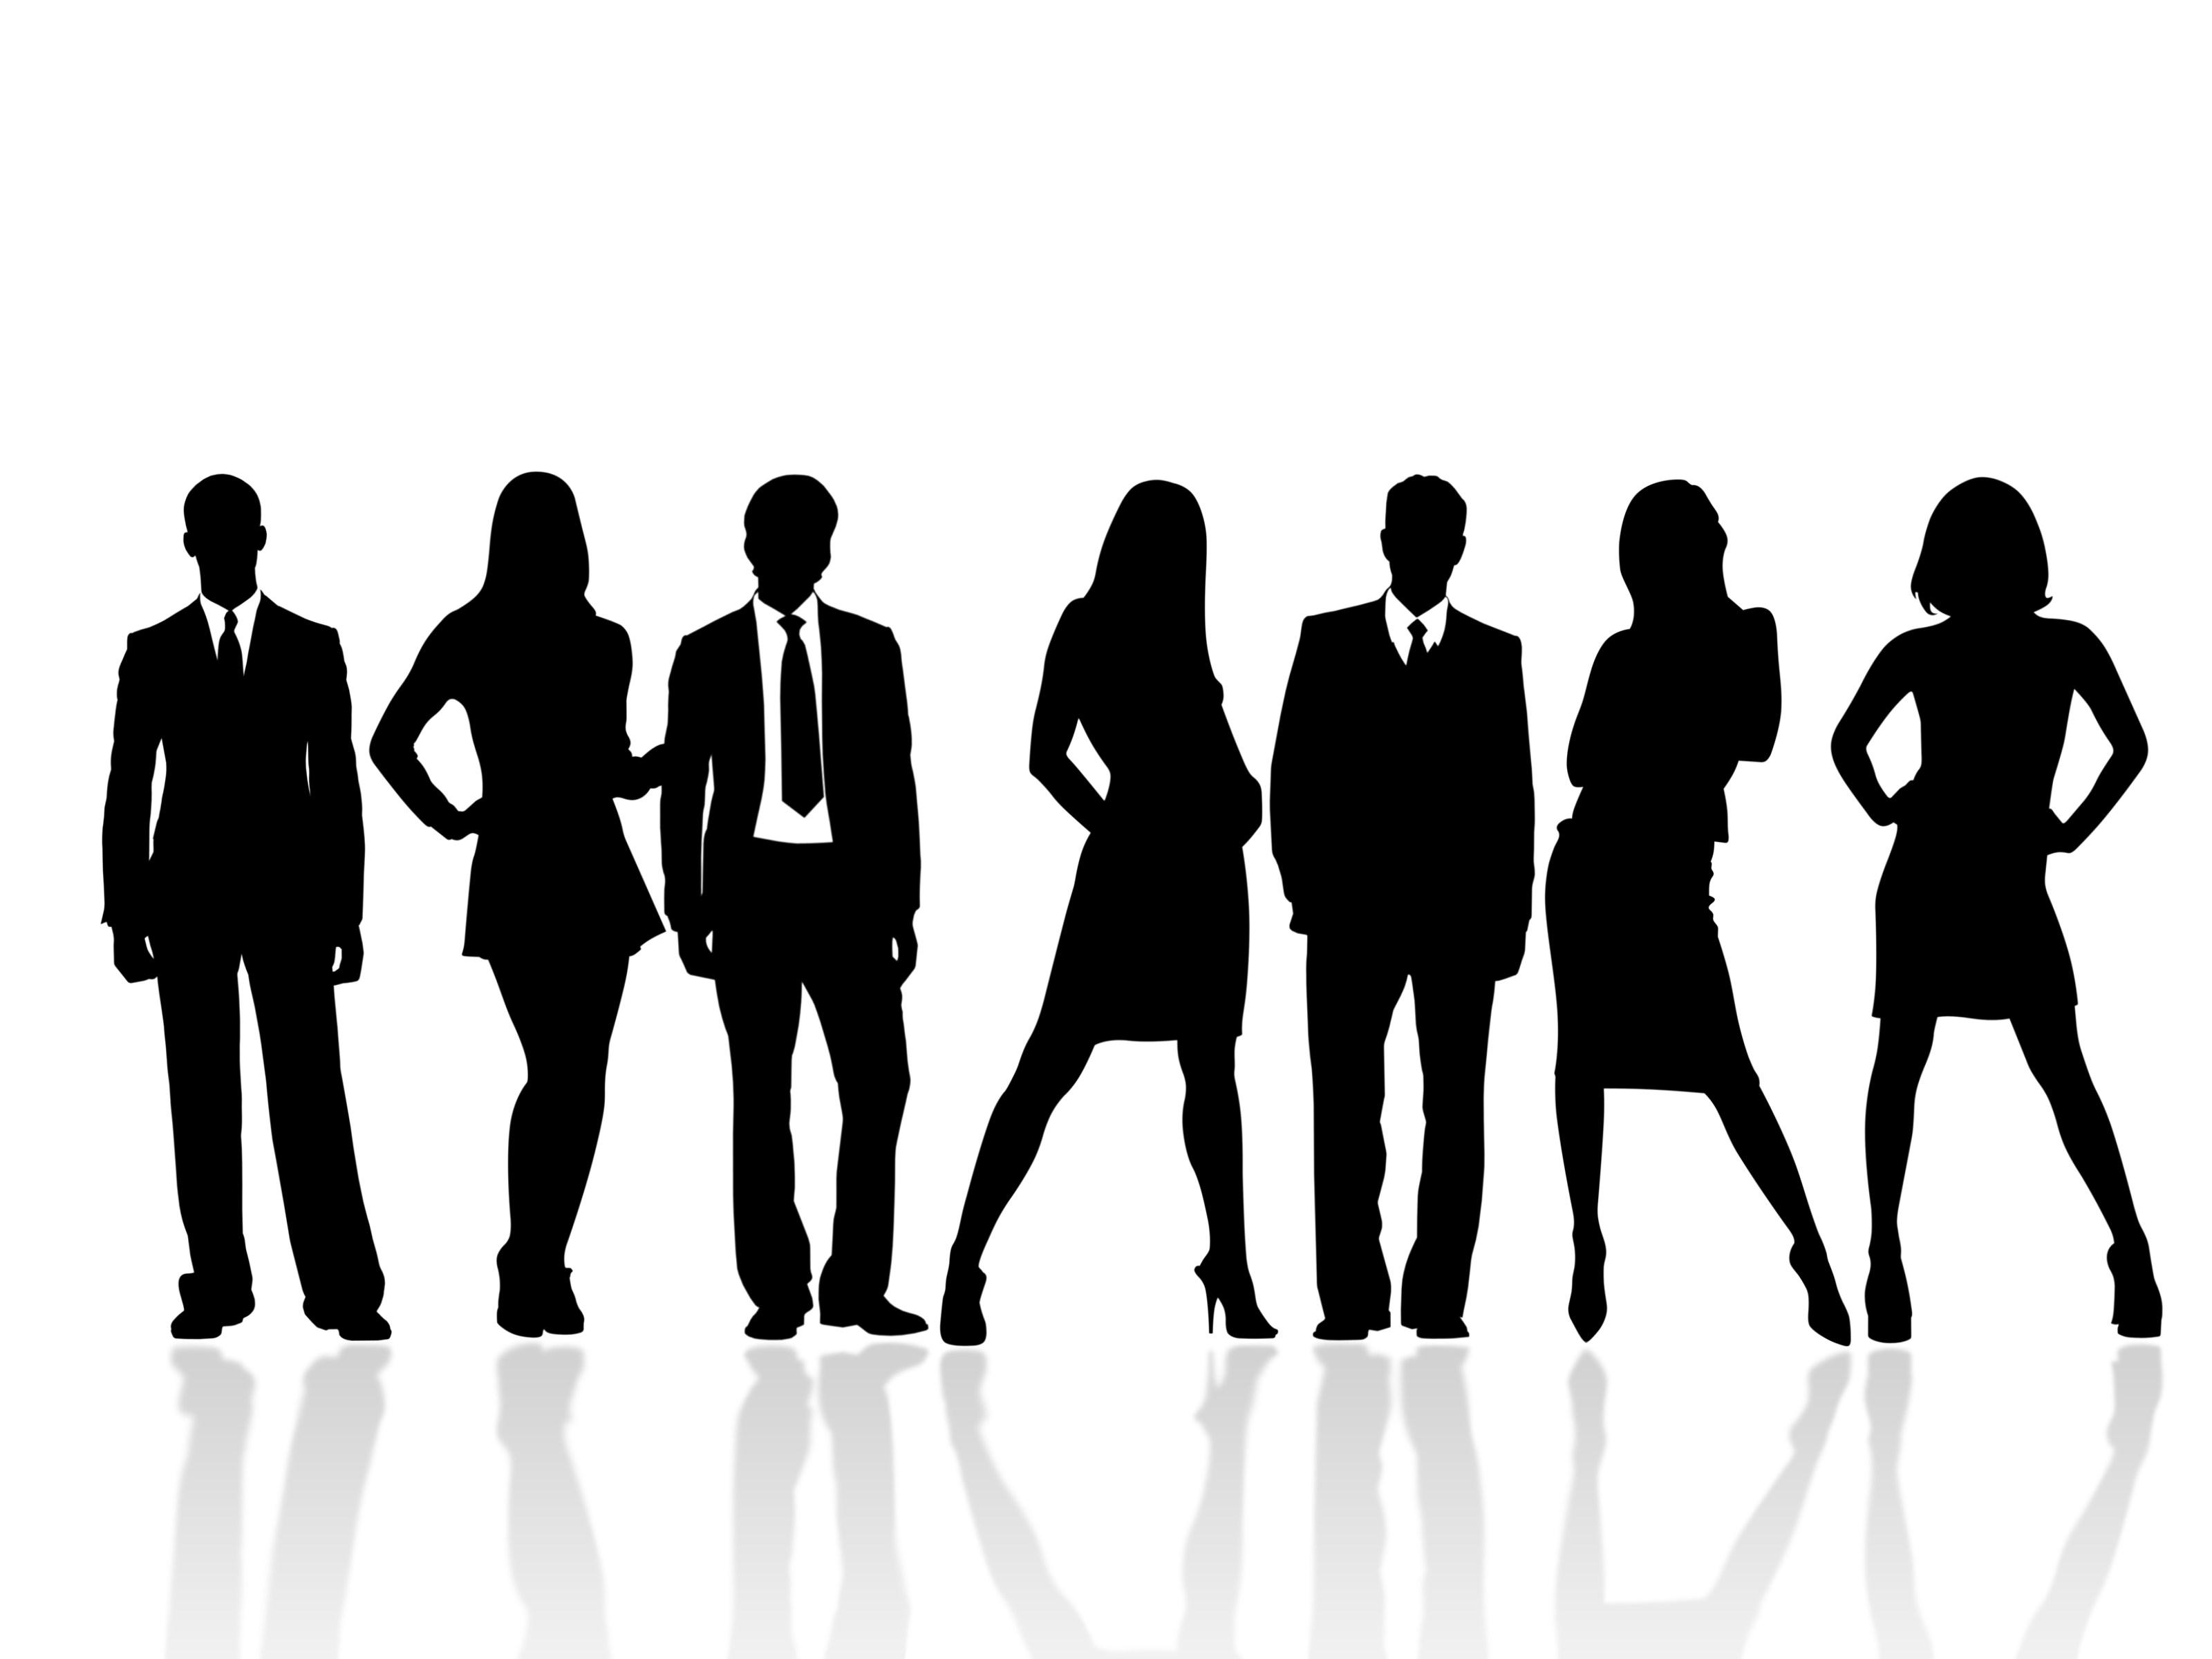 Professional business clipart 4 » Clipart Portal.